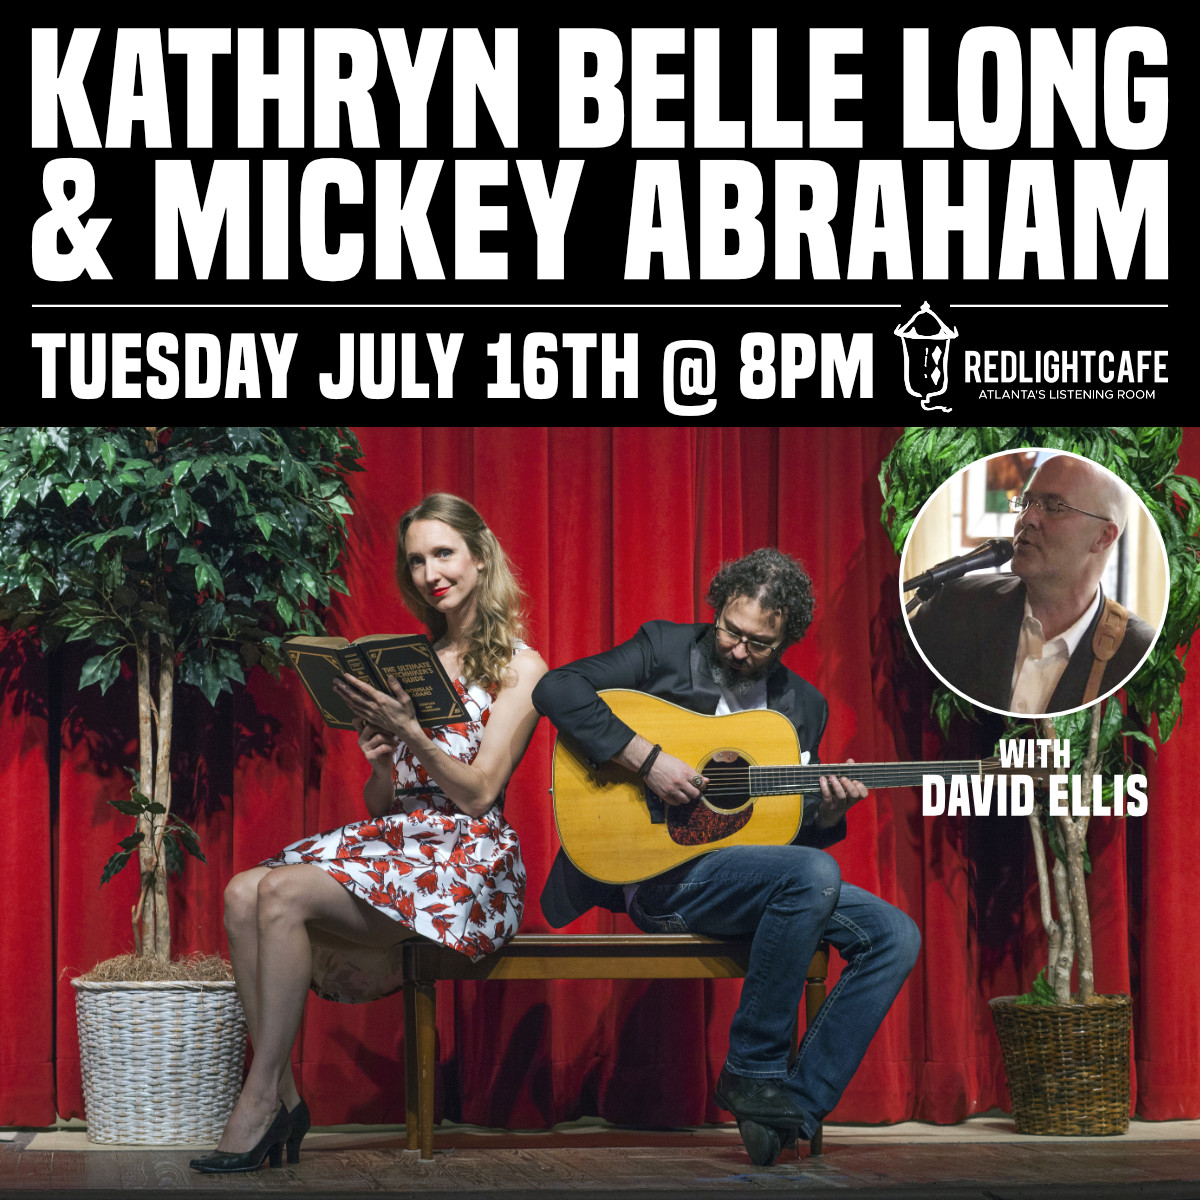 Kathryn Belle Long & Mickey Abraham w/ David Ellis — July 16, 2019 — Red Light Café, Atlanta, GA